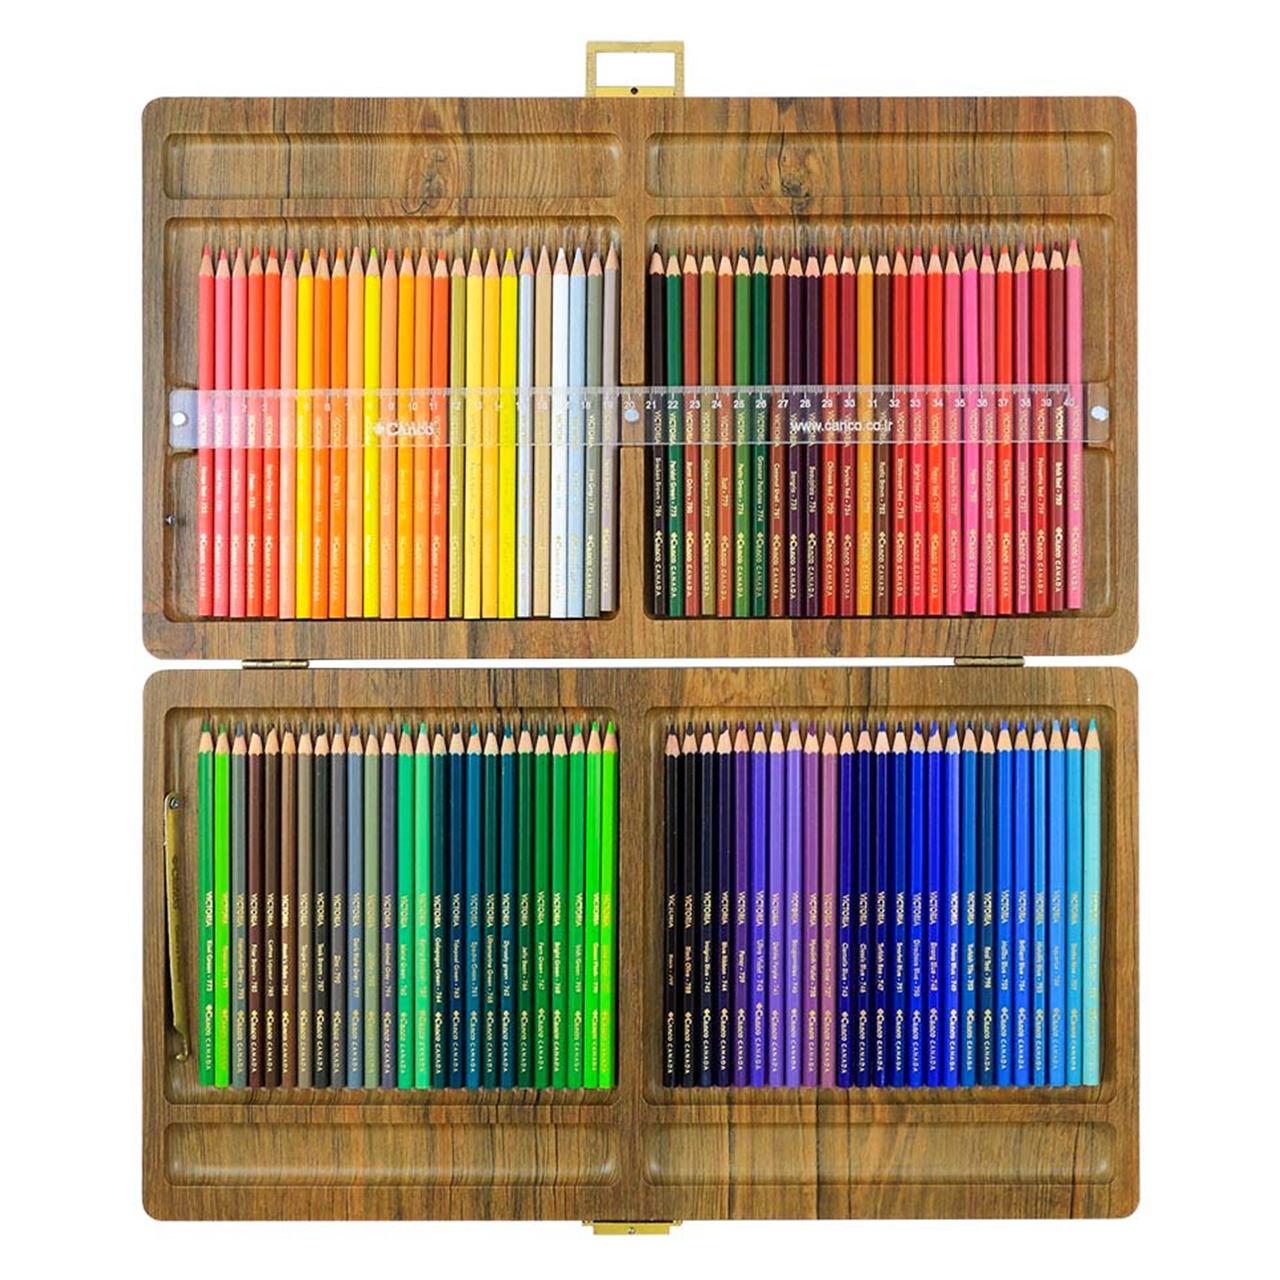 مداد رنگی 100 رنگ جعبه چوبی کنکو مدل ویکتوریا thumb